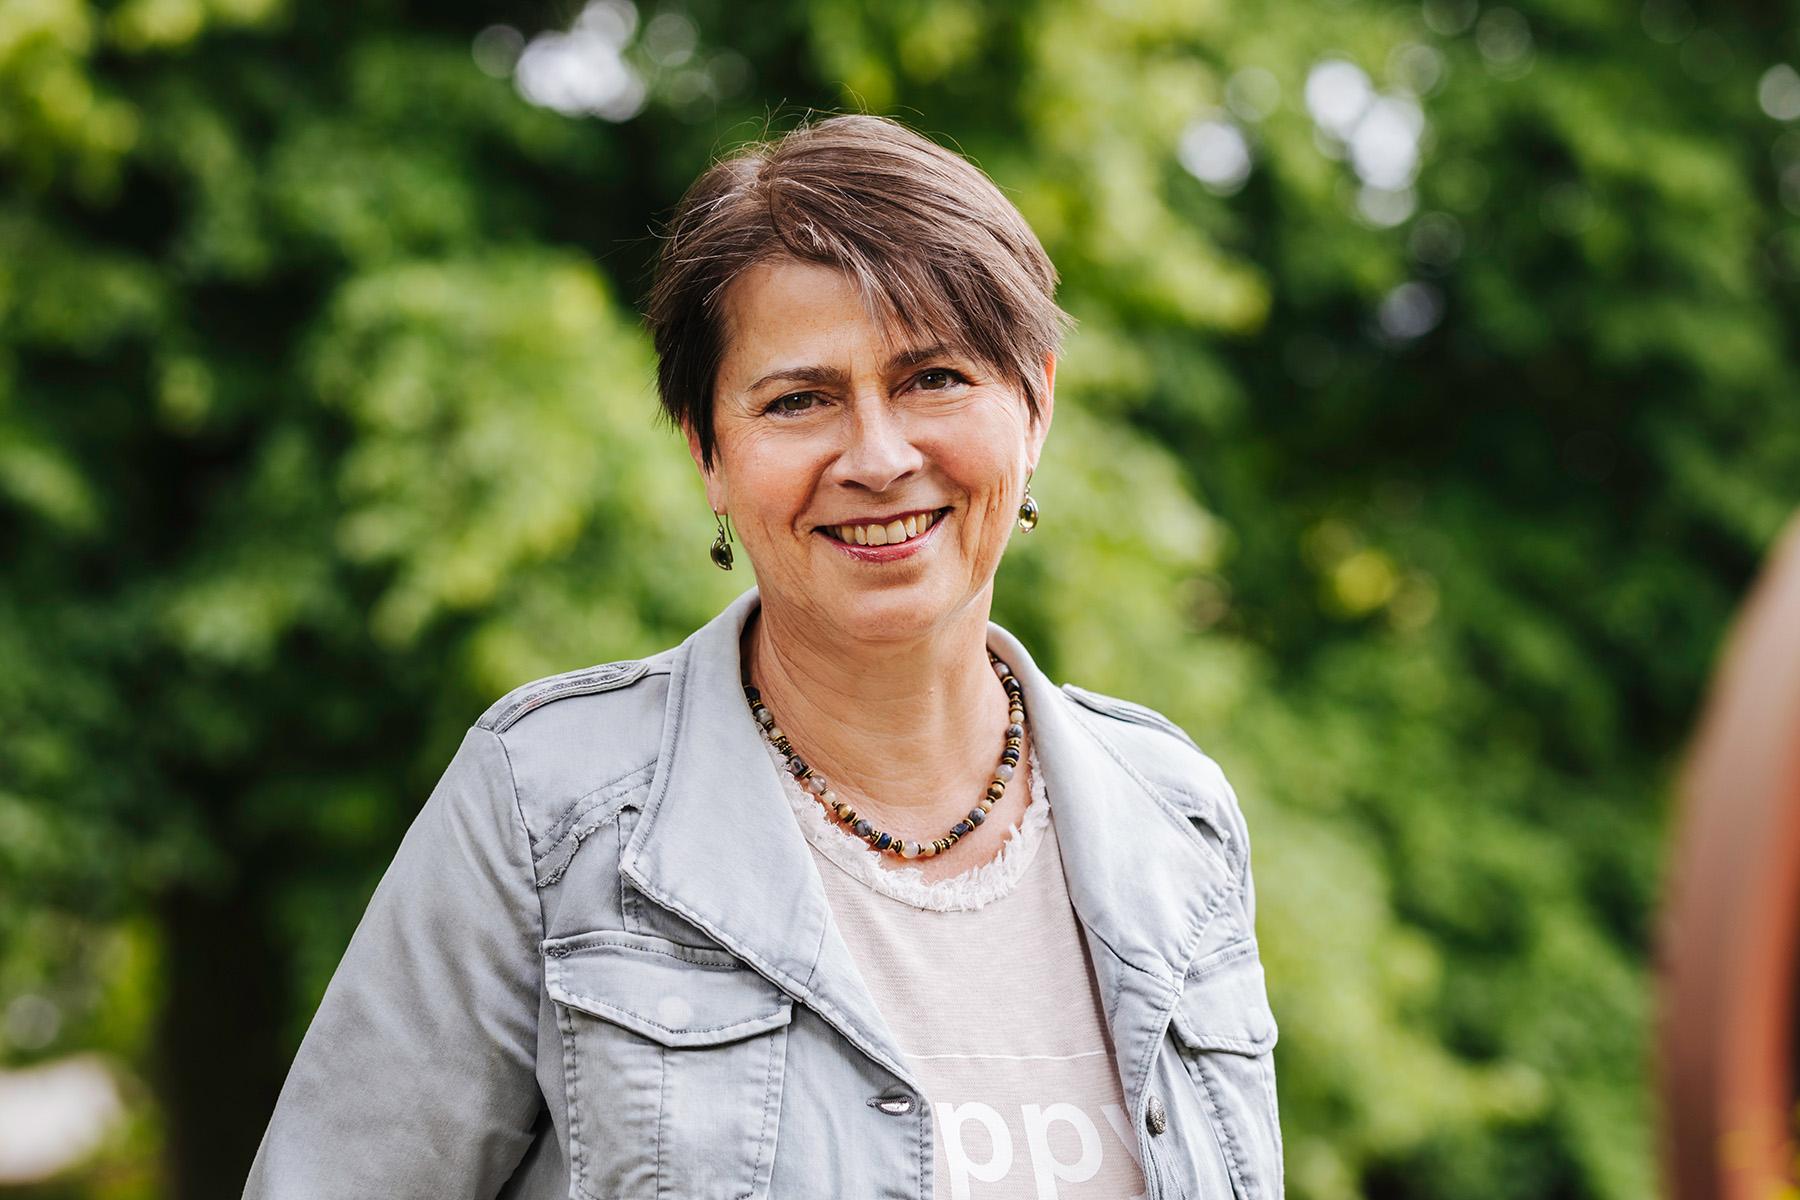 Angela Gunkel